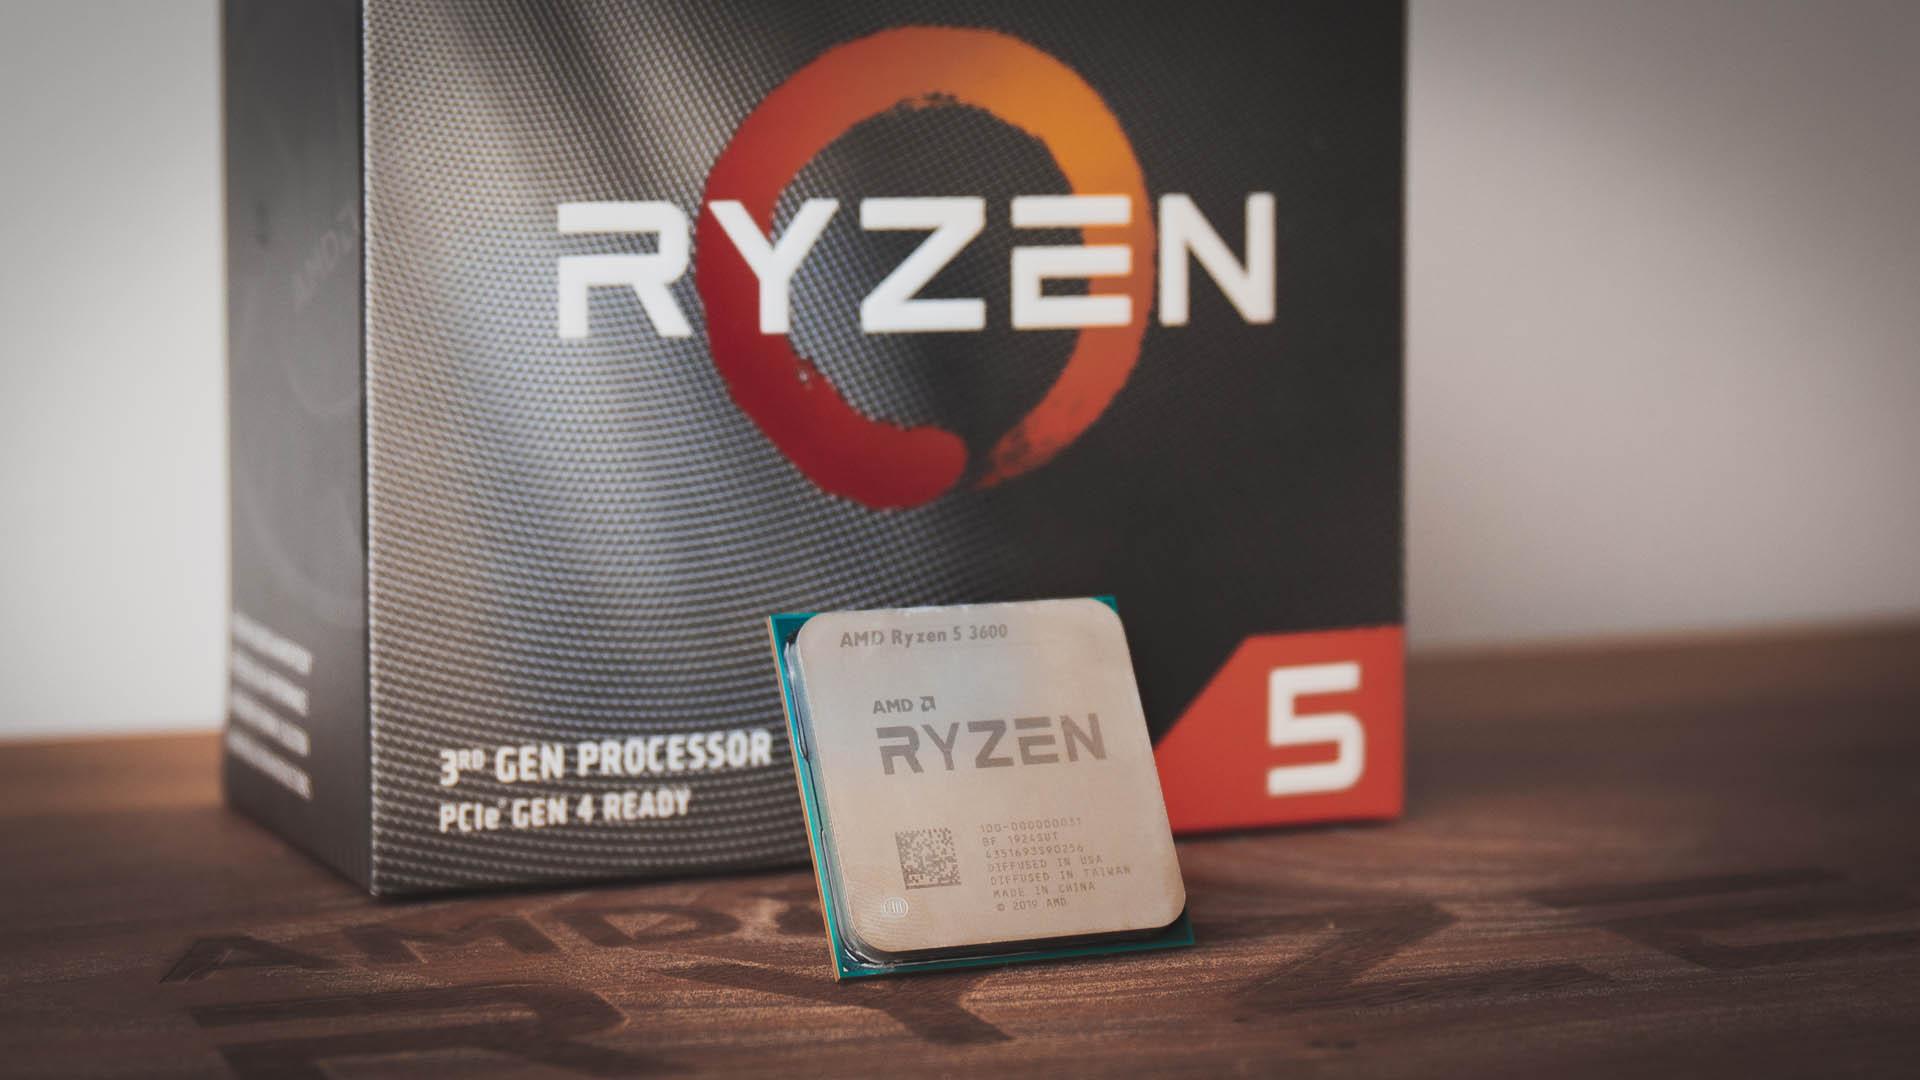 Amd Ryzen 5 3600x Vs 3600 Which Is The Better Cpu Buy Pcgamesn